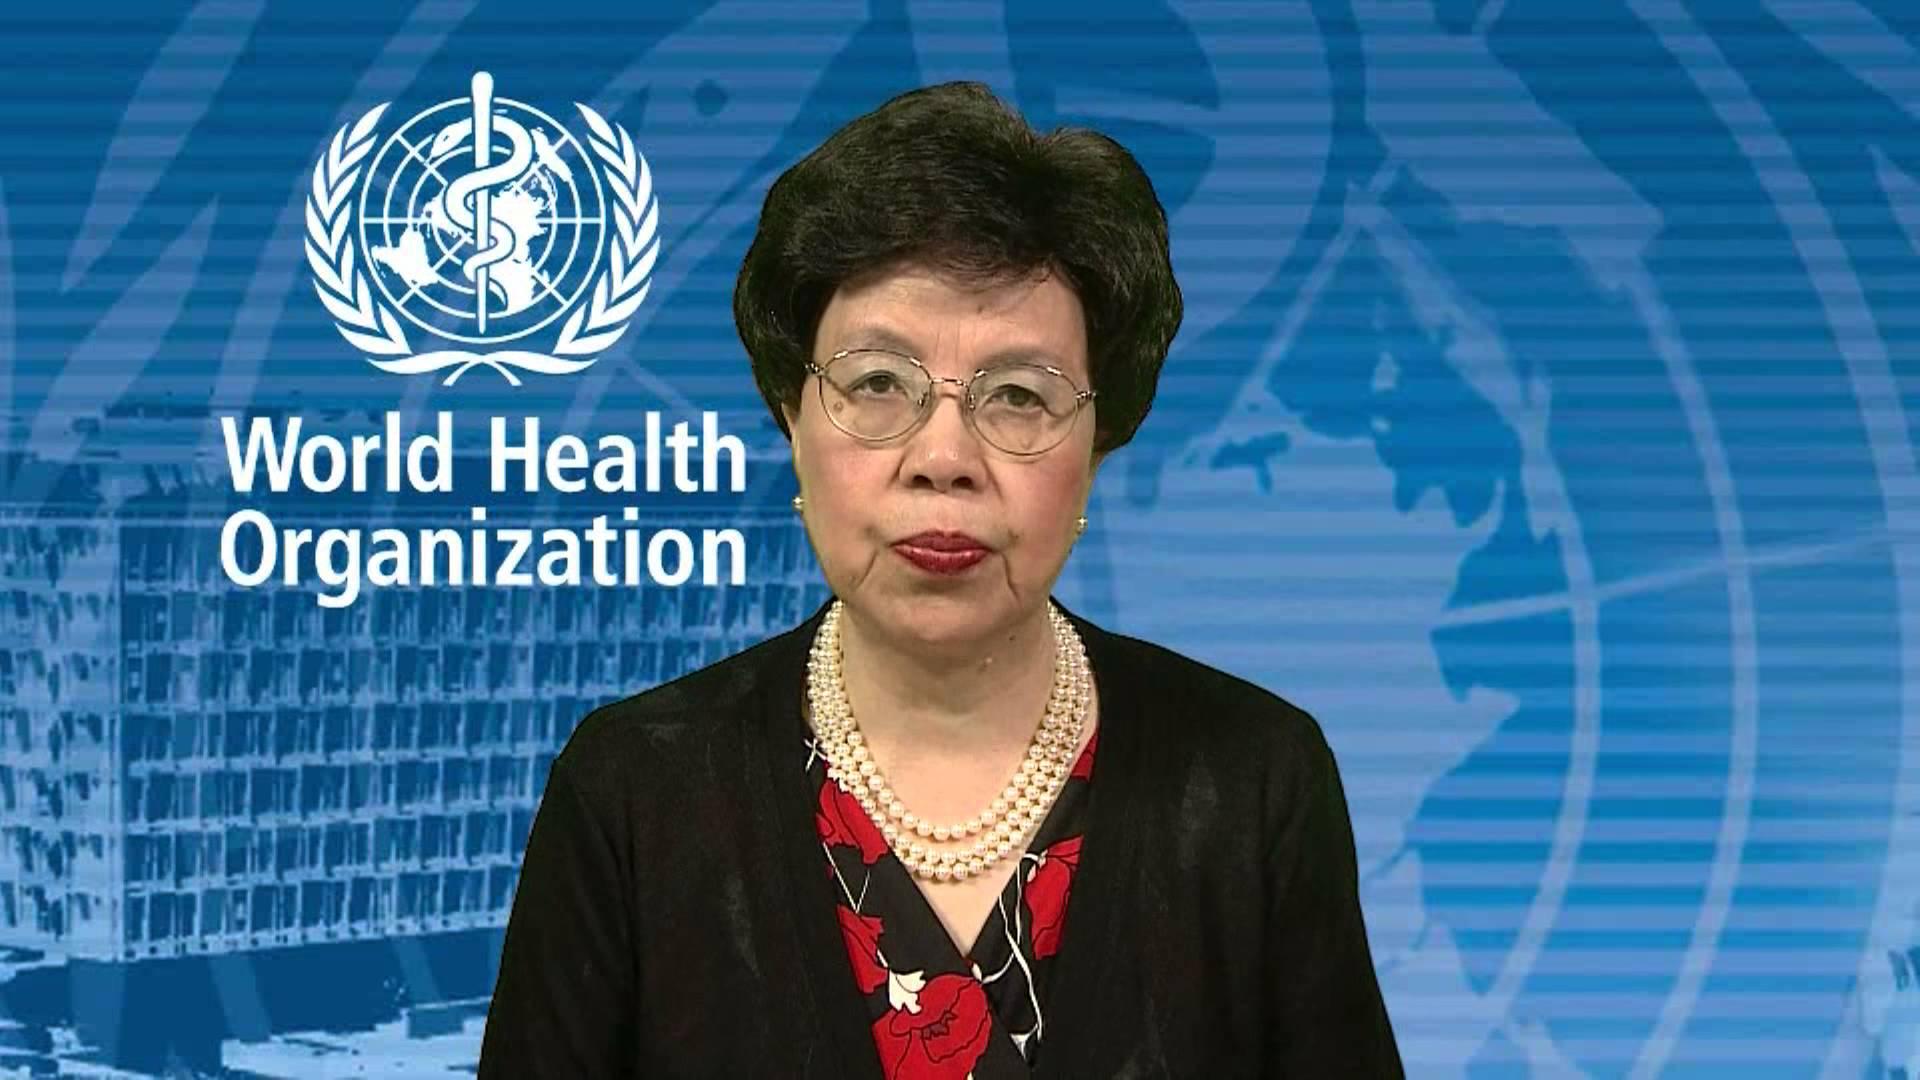 Dr-Margaret-Chan-Director-General-of-WHO.jpg